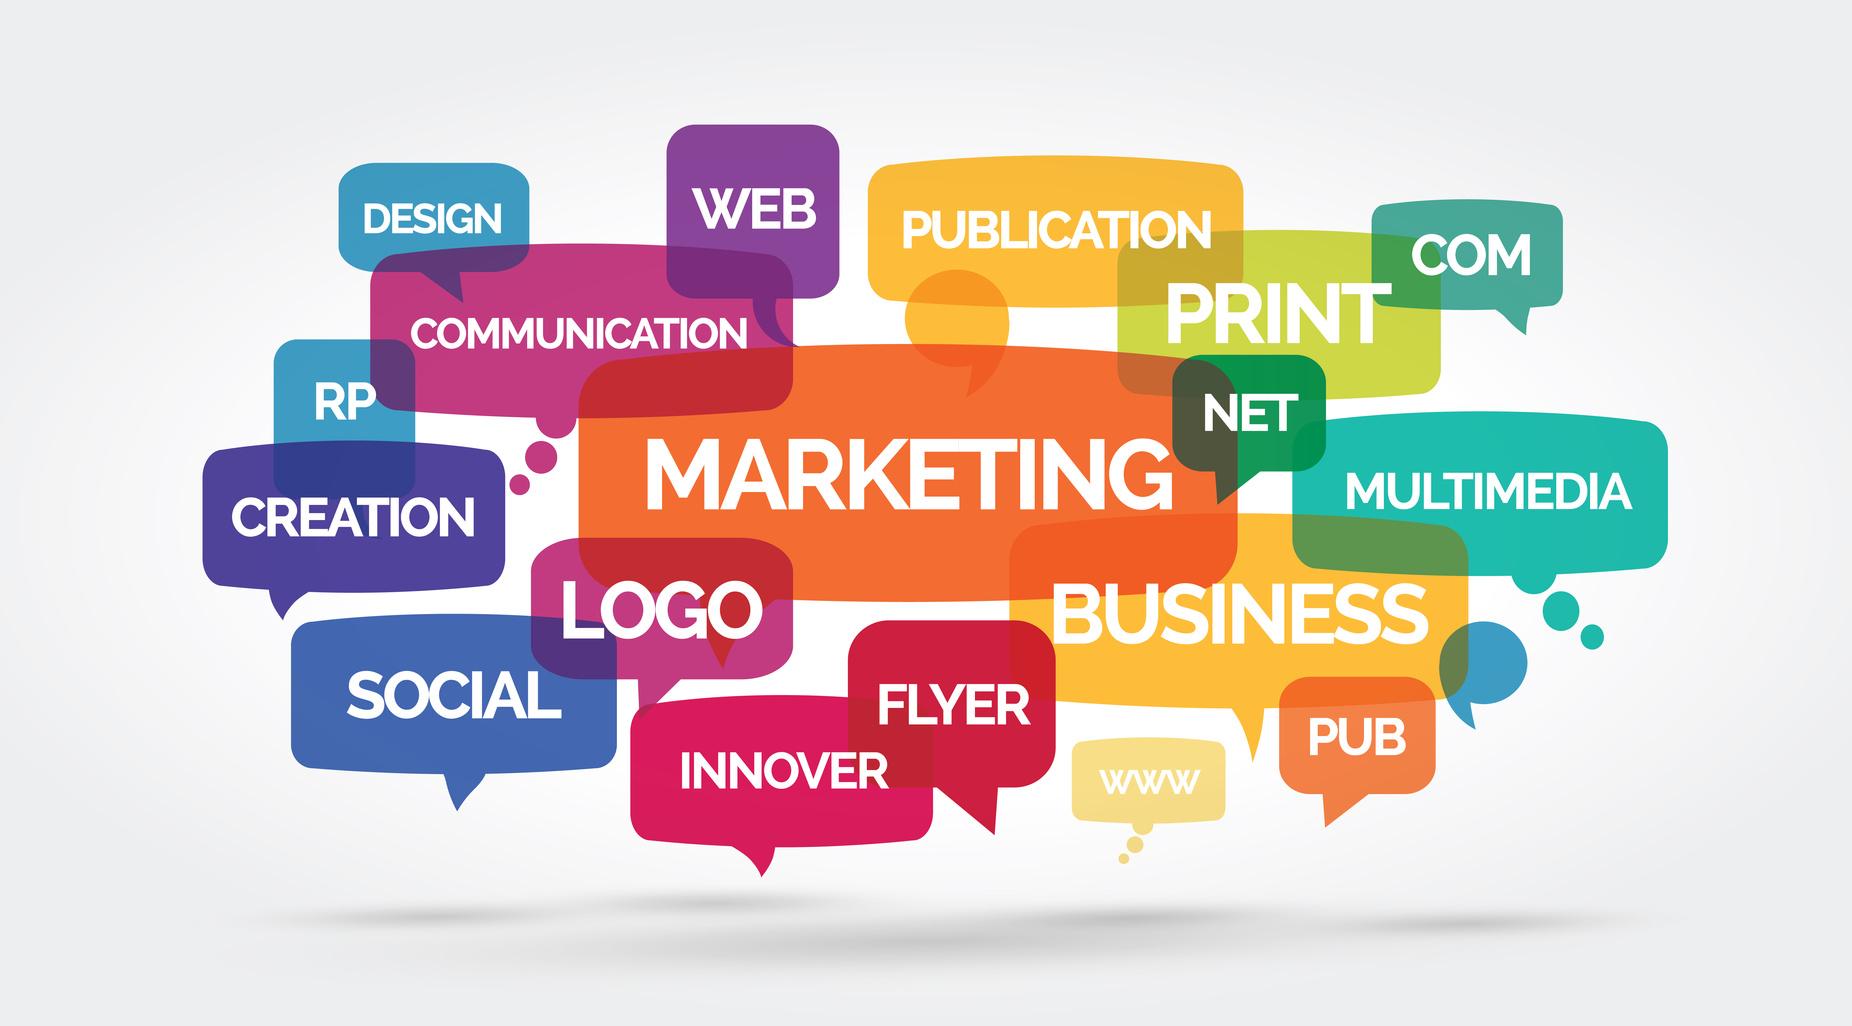 creating a marketing - How to choose a marketing agency? Blog I Socjal Media Blog Nakatomi Advertising Agency